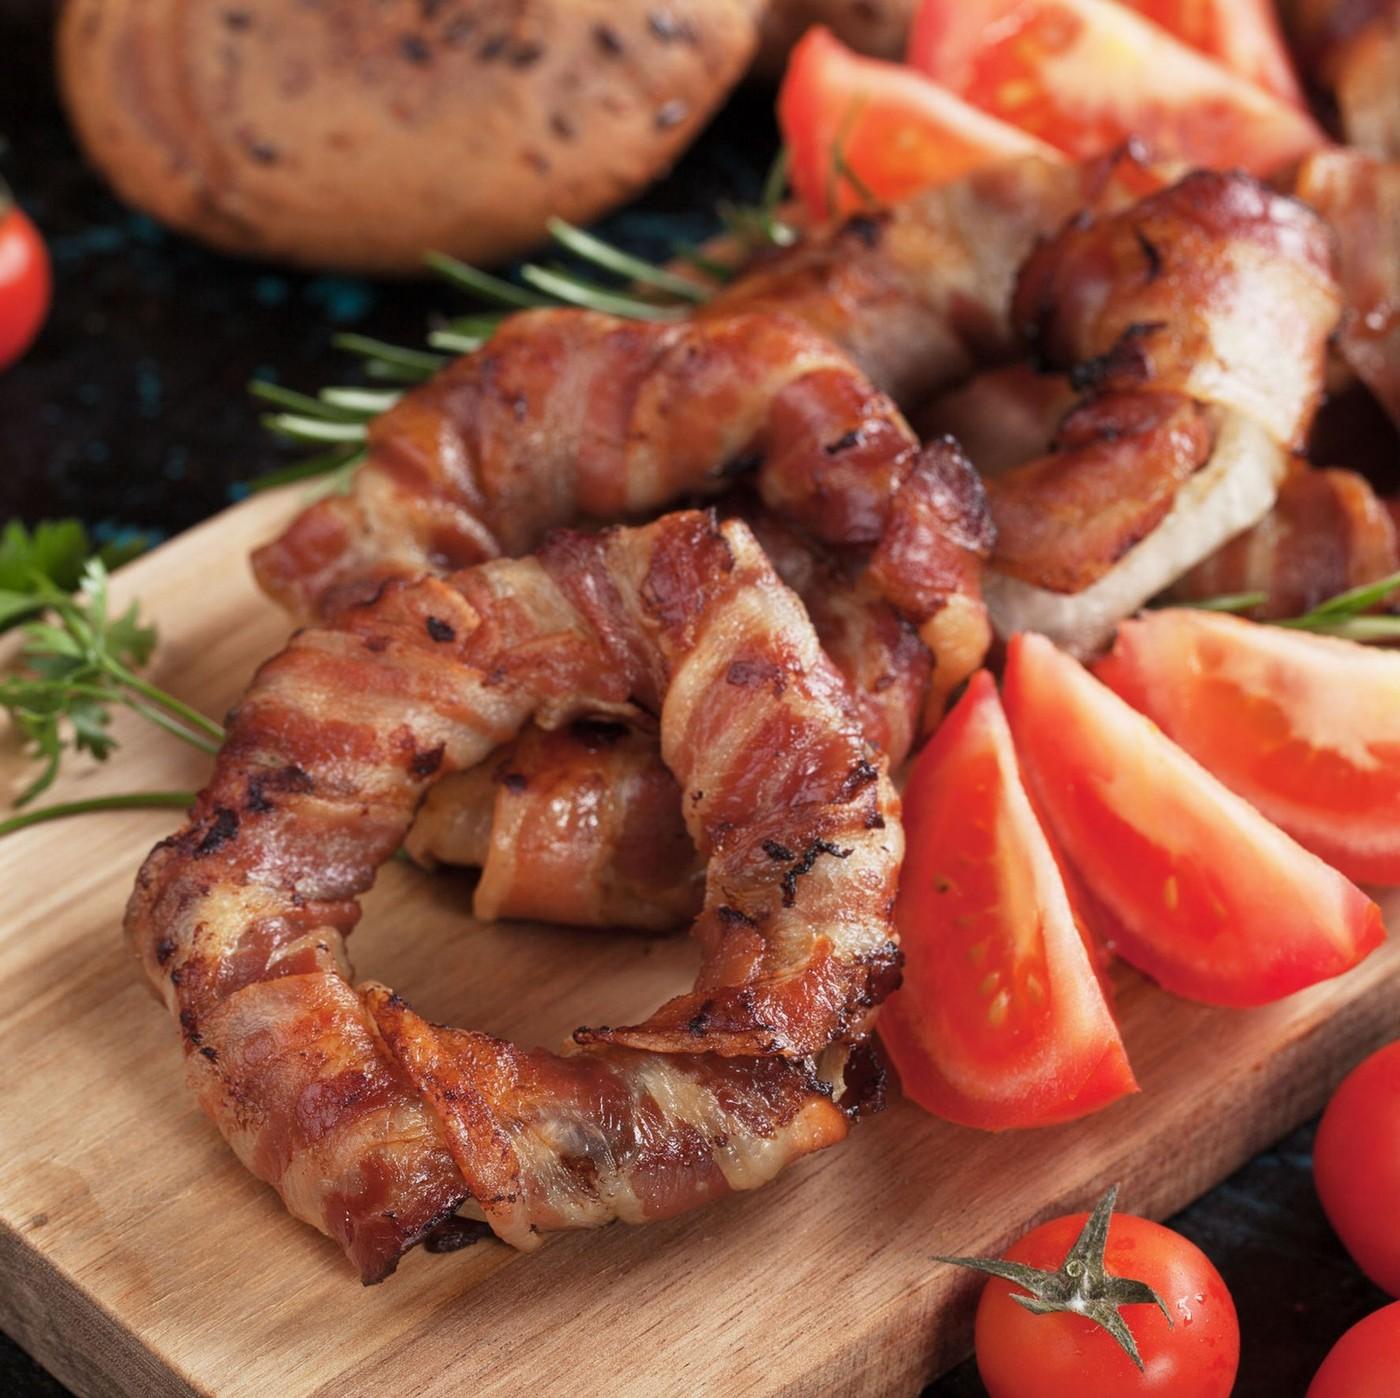 receta de Bacon Cocido Ahumado Solfiore